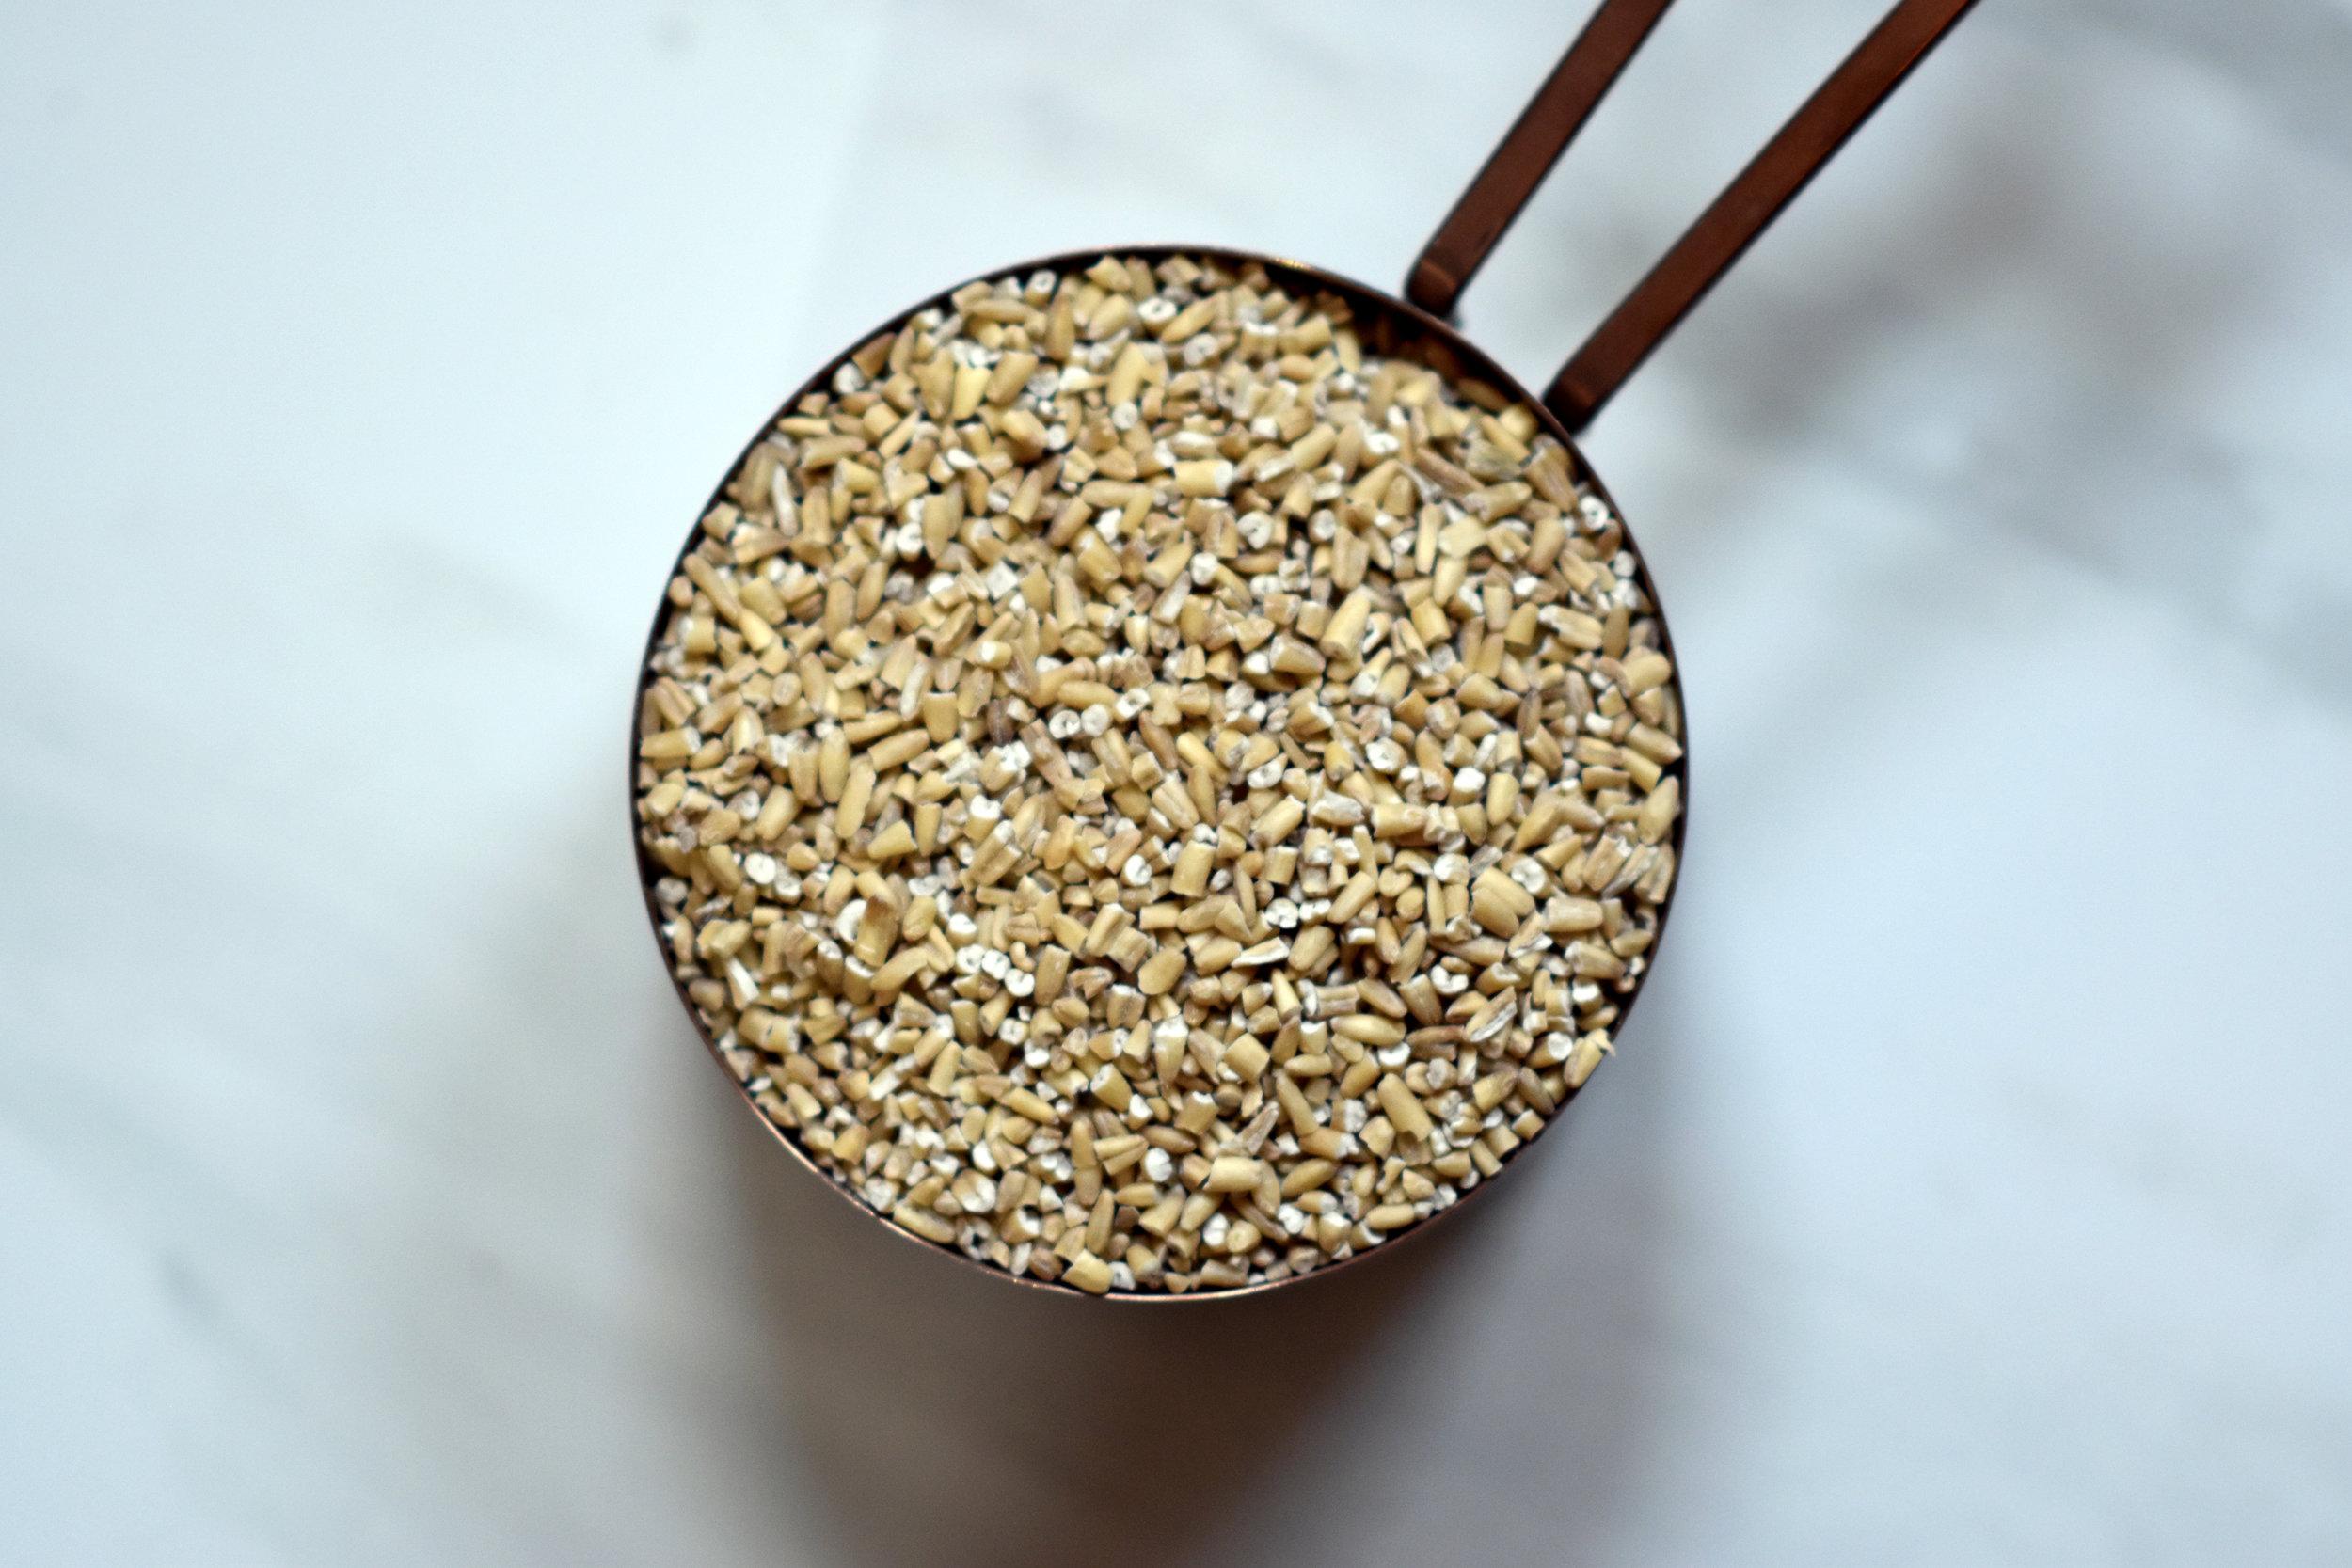 raw steel cut oats - because i love oats, my heart & marketing tricks